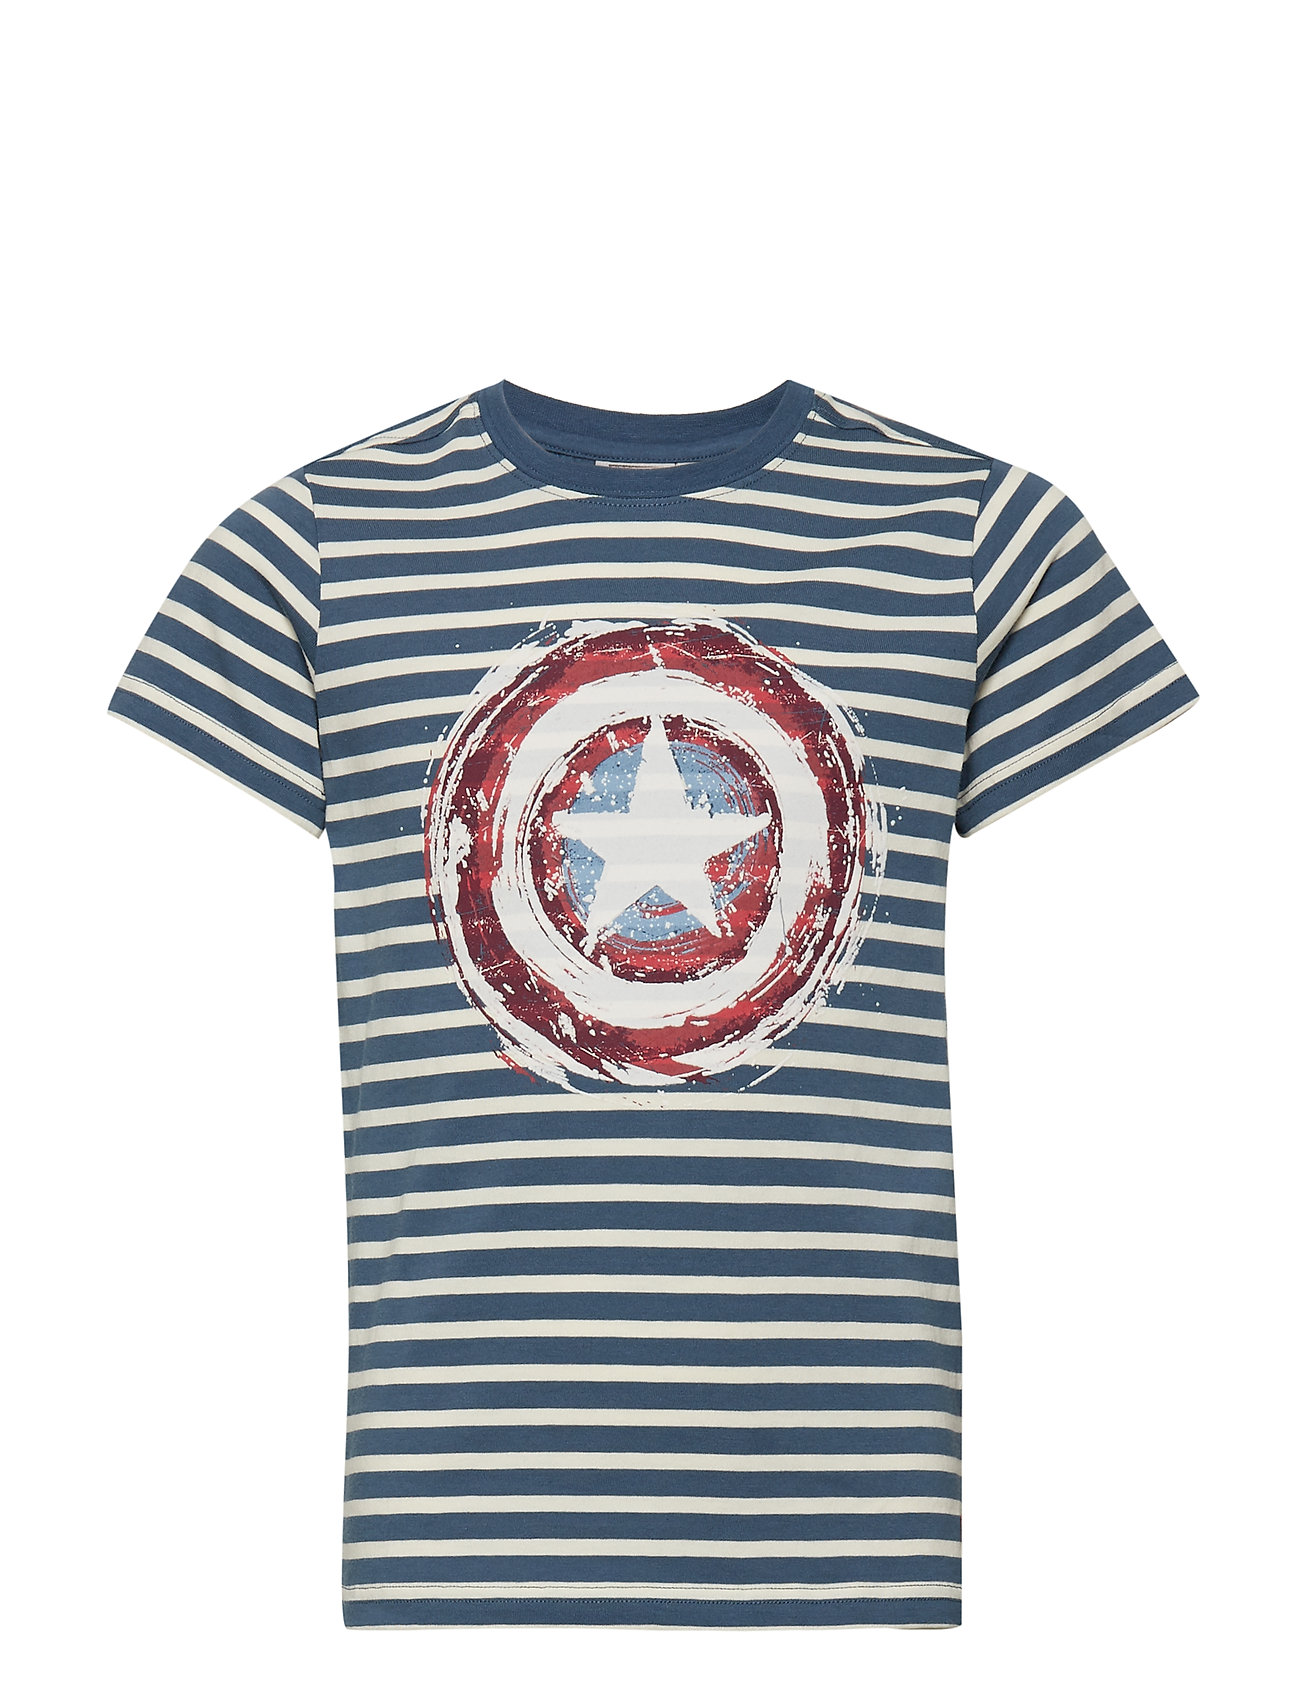 Disney by Wheat T-Shirt Captain A Shield - BERING SEA